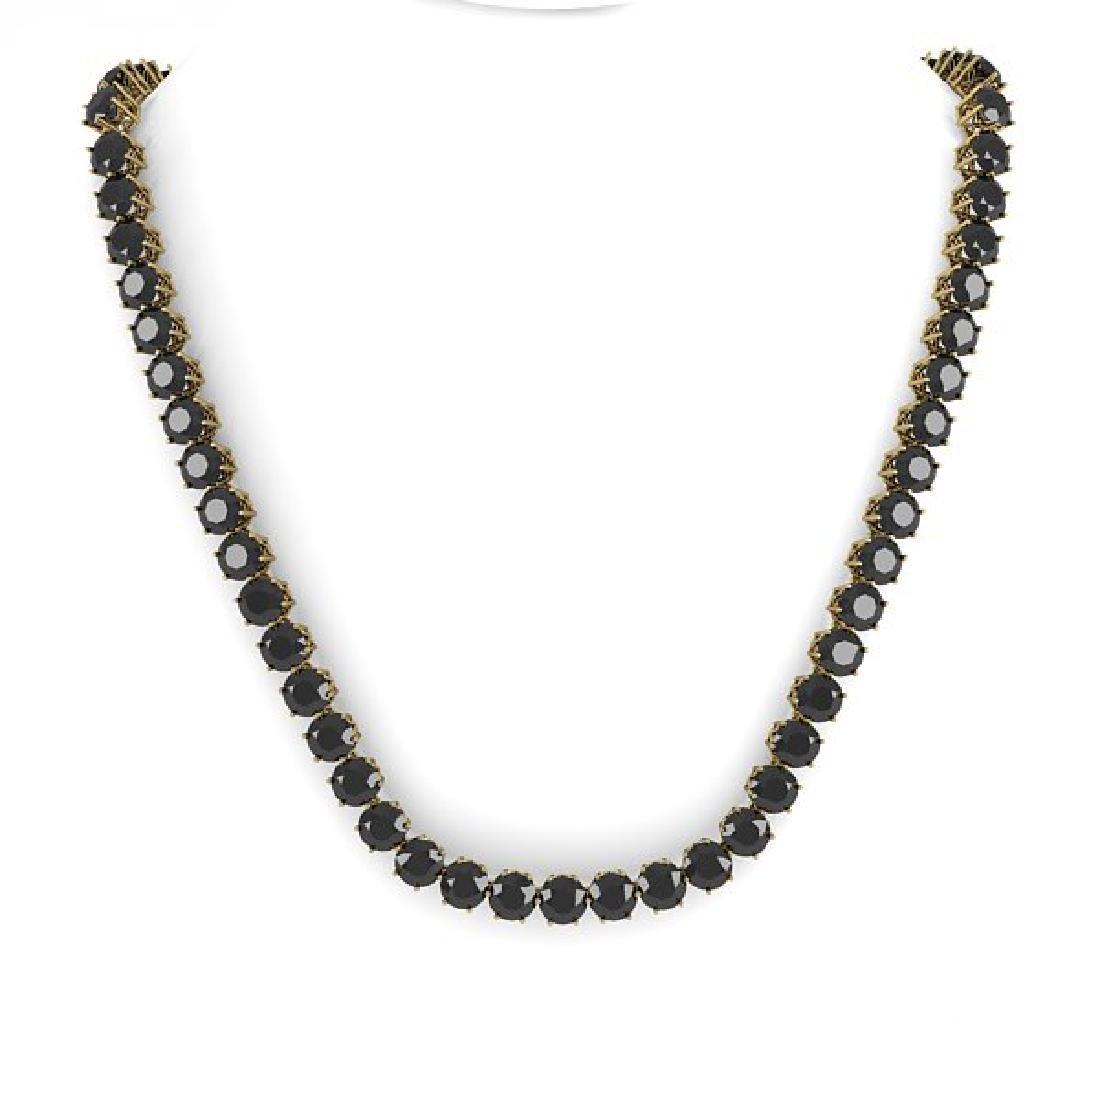 36 CTW Certified Black VS Diamond Necklace 14K Yellow - 3